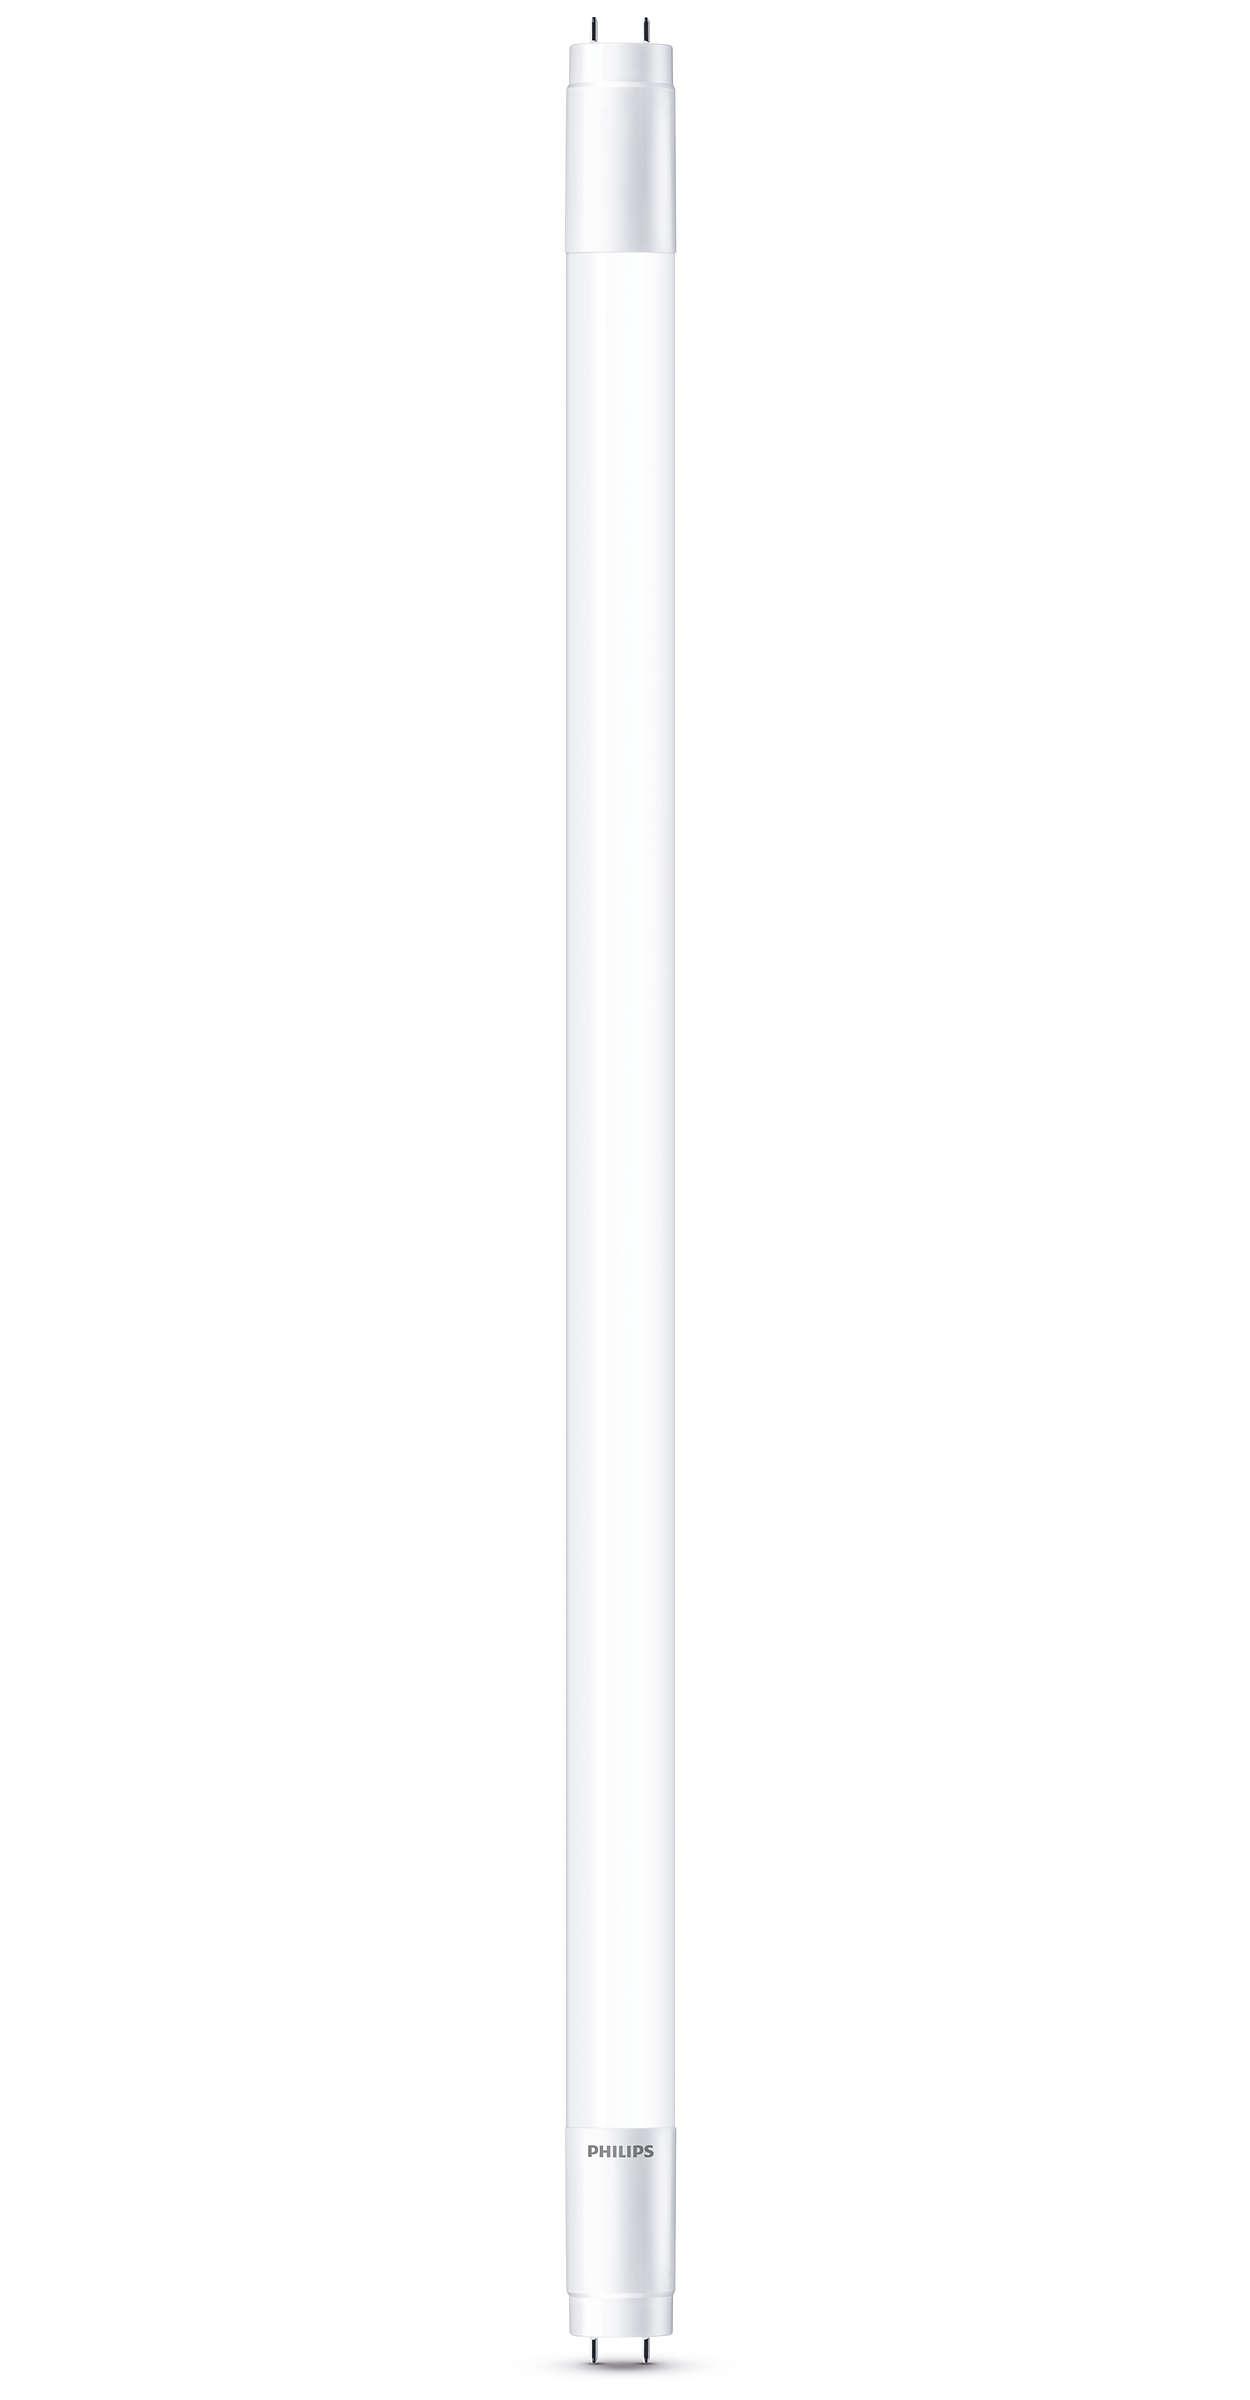 Kestävä ja laadukas LED-kohdevalo